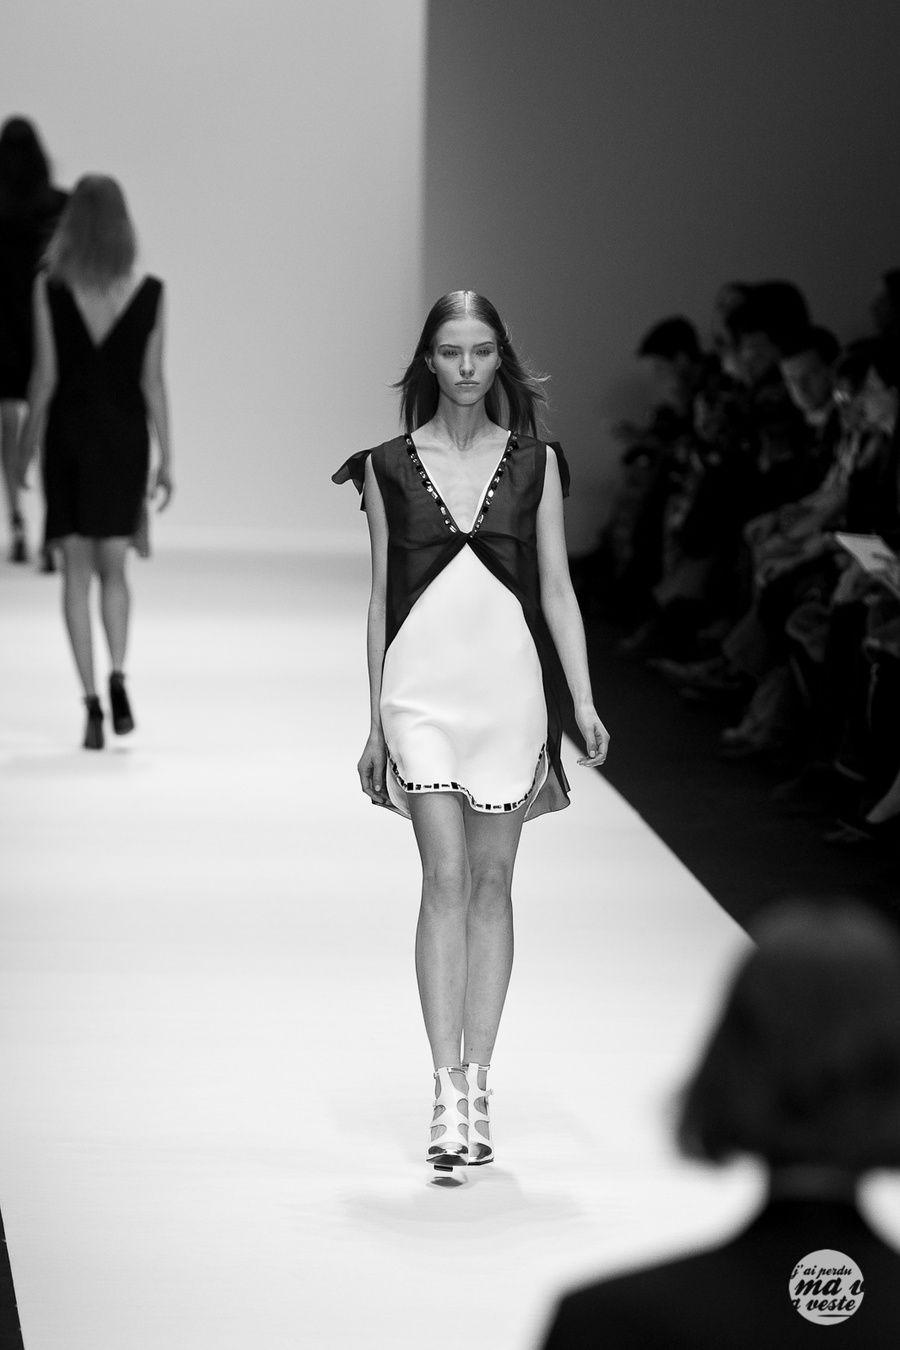 #Paris Fashion week #VanessaBruno  #streetstyle #jpmv #fashion www.nabilequenum.com